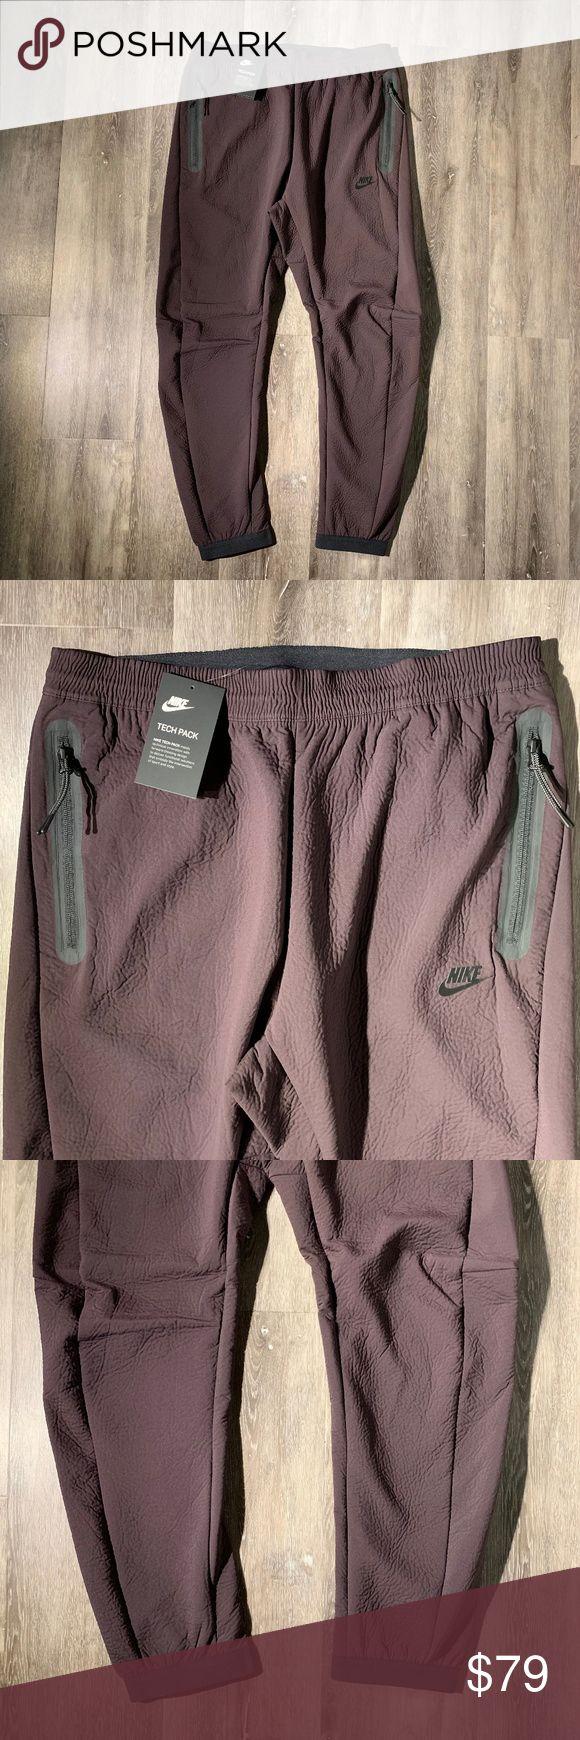 Nike Sportswear Tech Pack Woven Pants Tracksuit NWT Nike